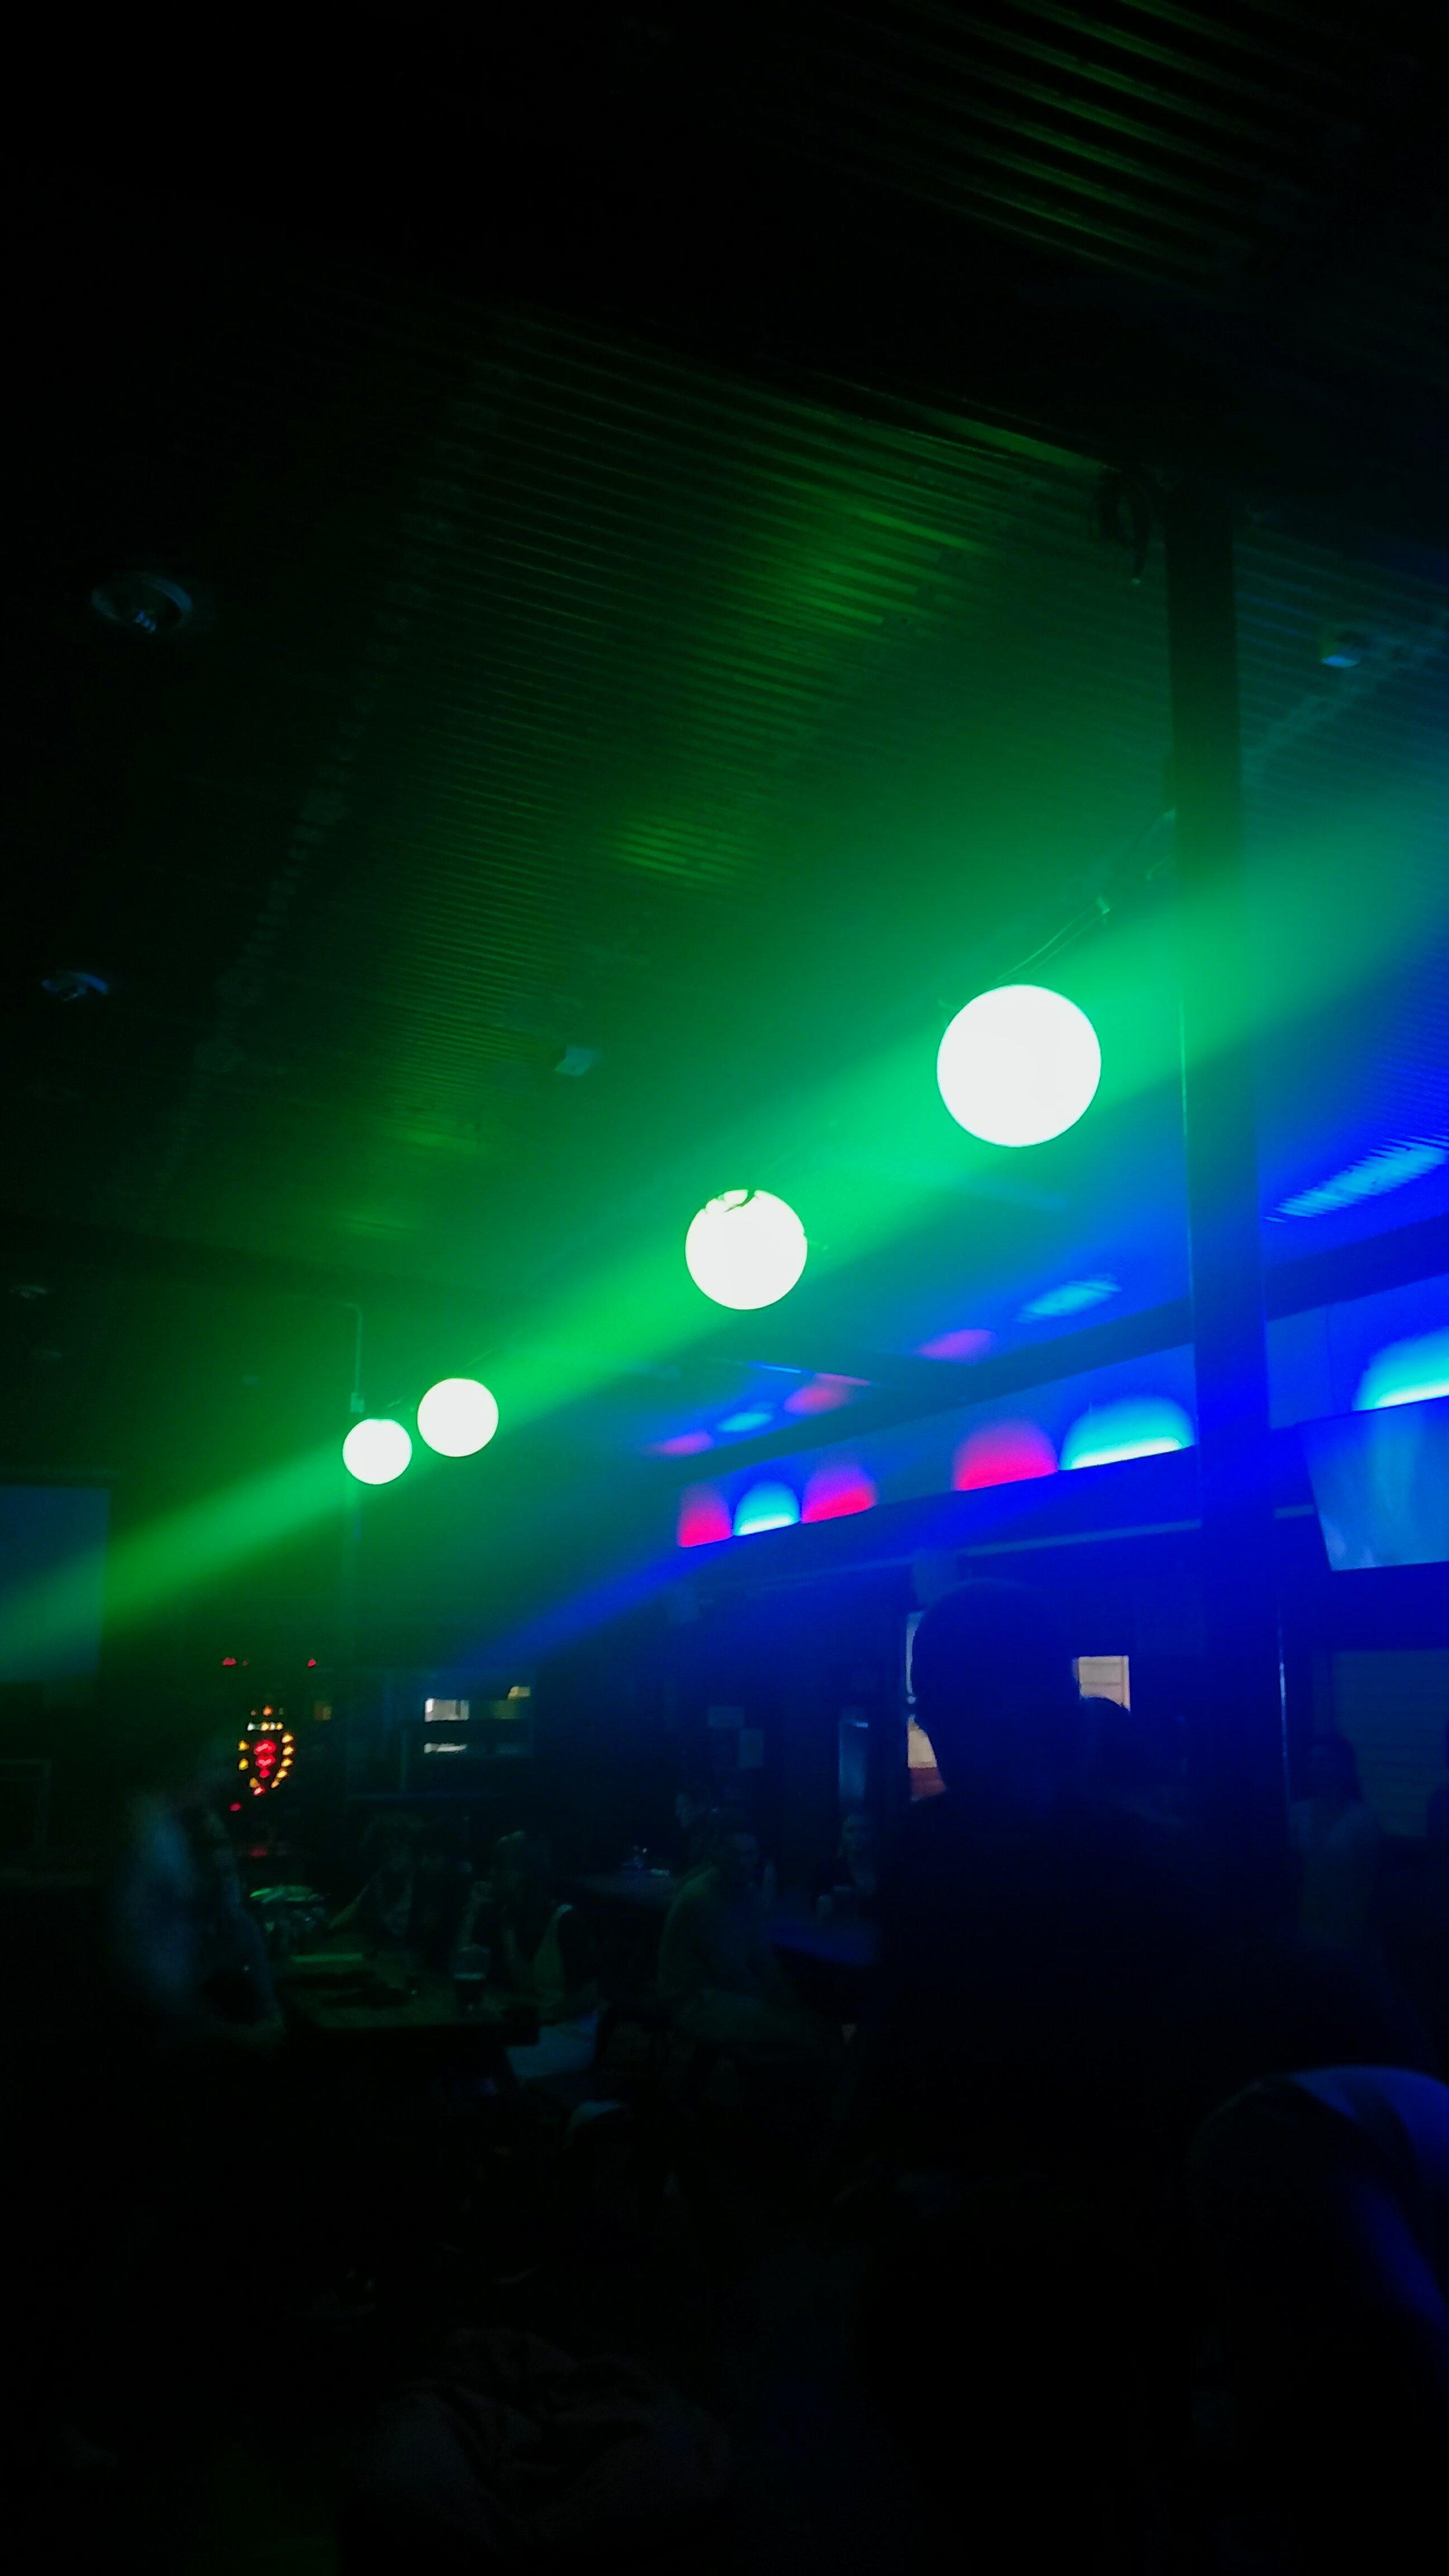 Neon lights in bar